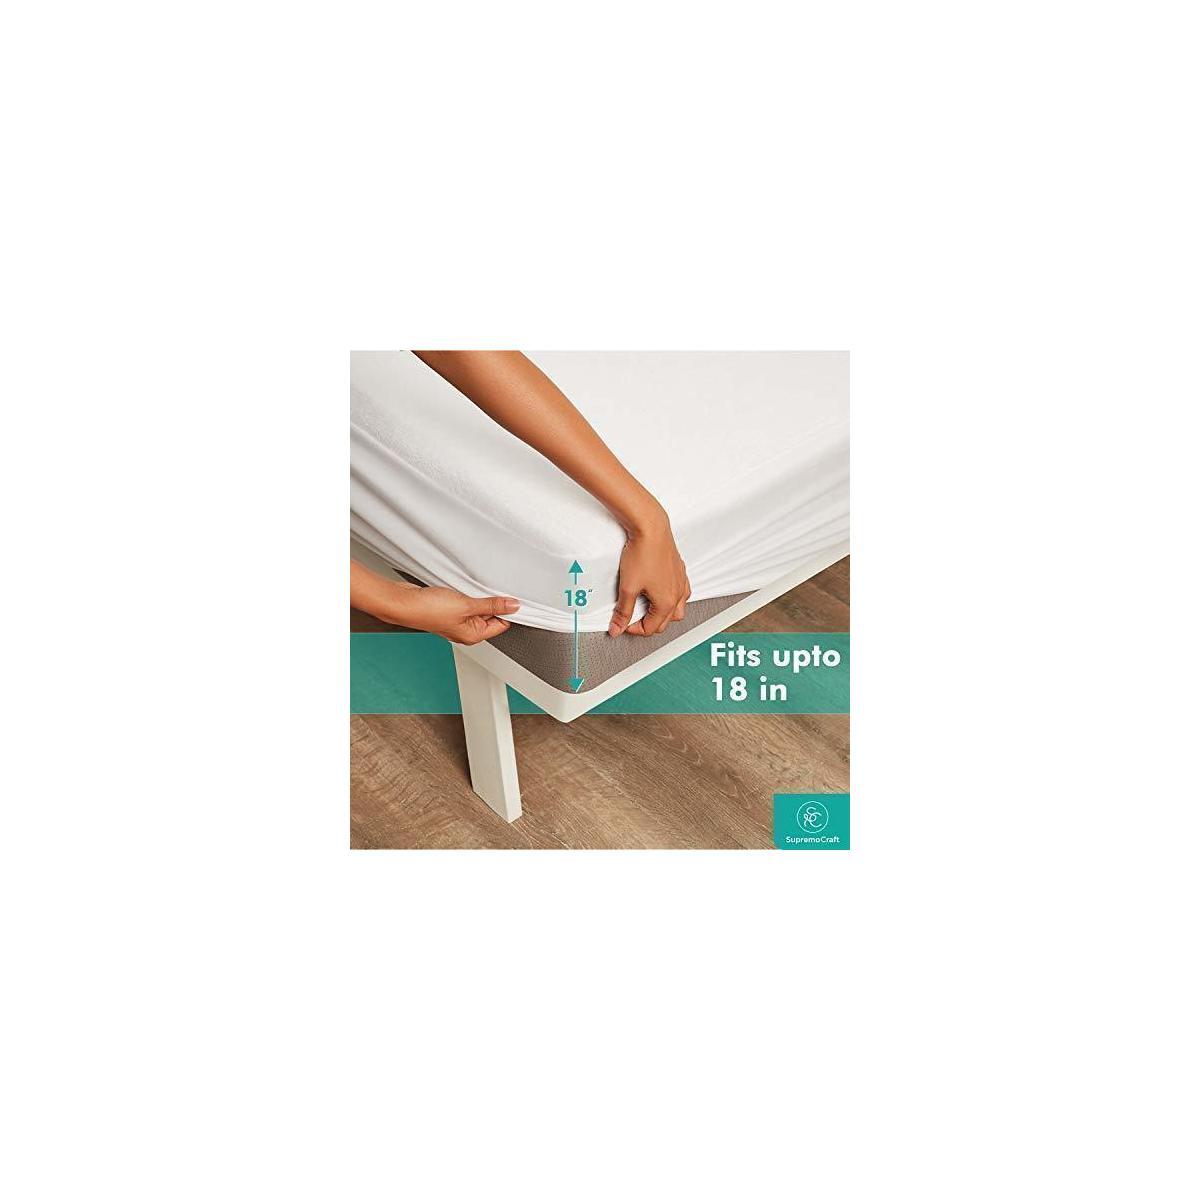 Supremo Craft Waterproof Mattress Protector California King Size - 100% Organic Cotton Breathable Mattress Pad Cover, Deep Pocket, Vinyl Free - [72